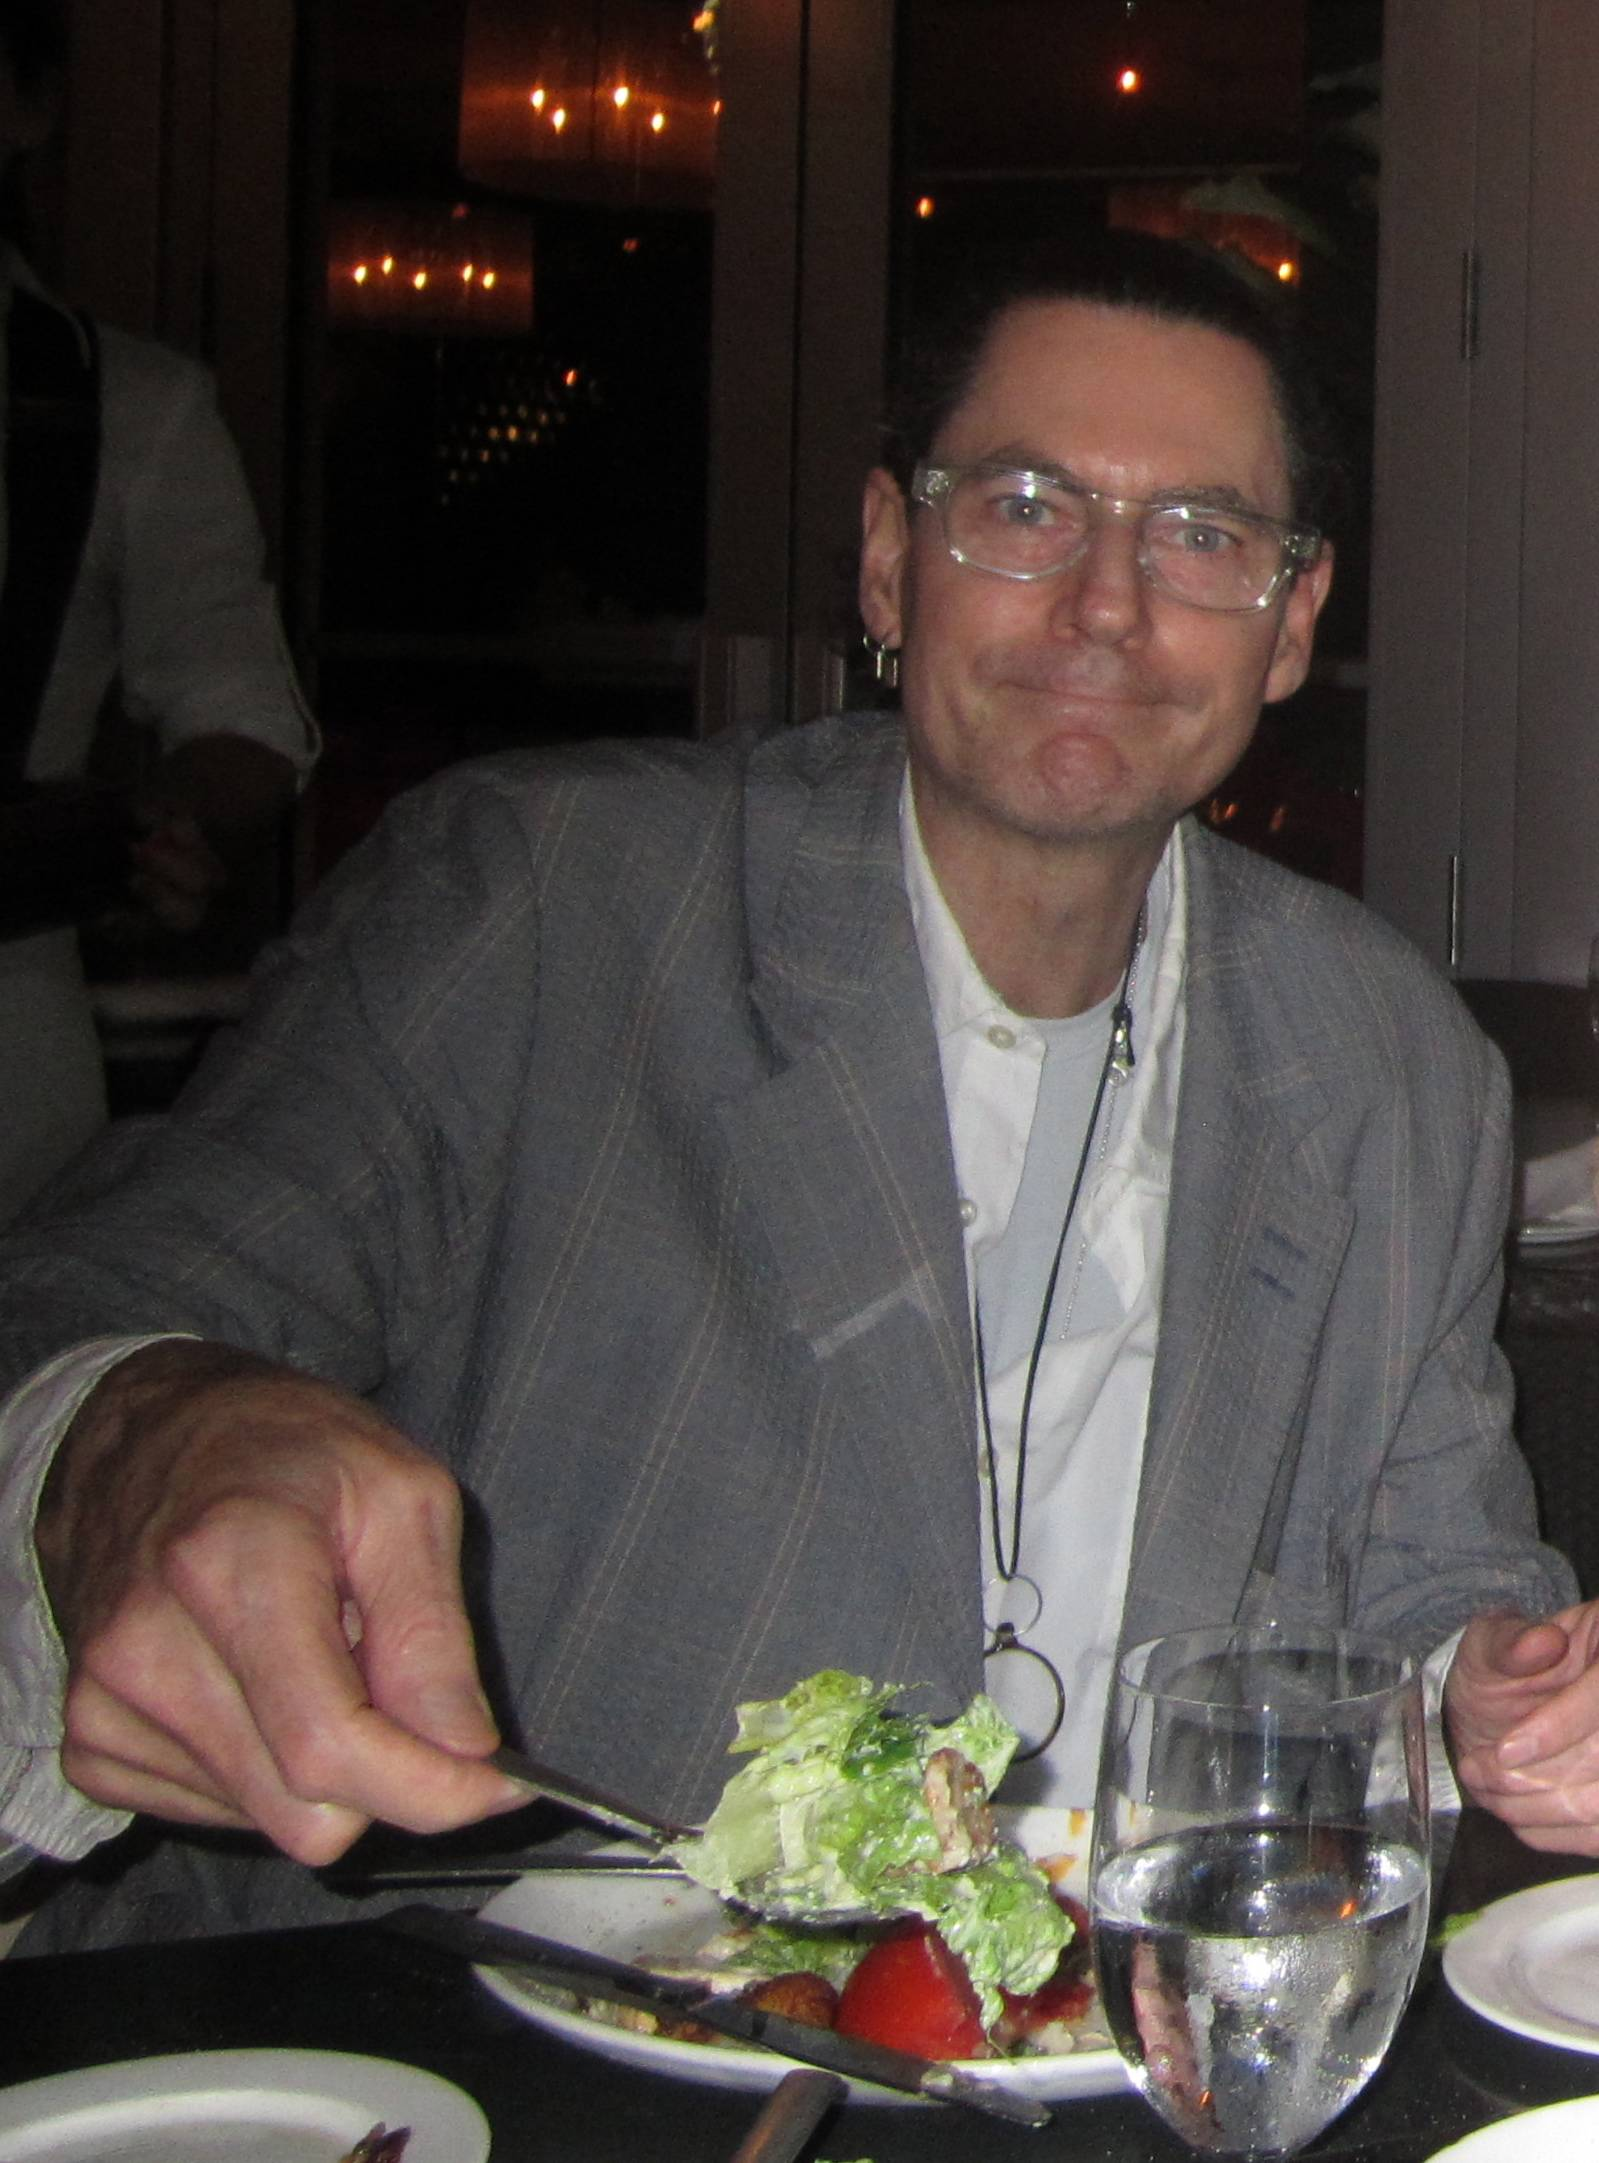 producer David Saltz